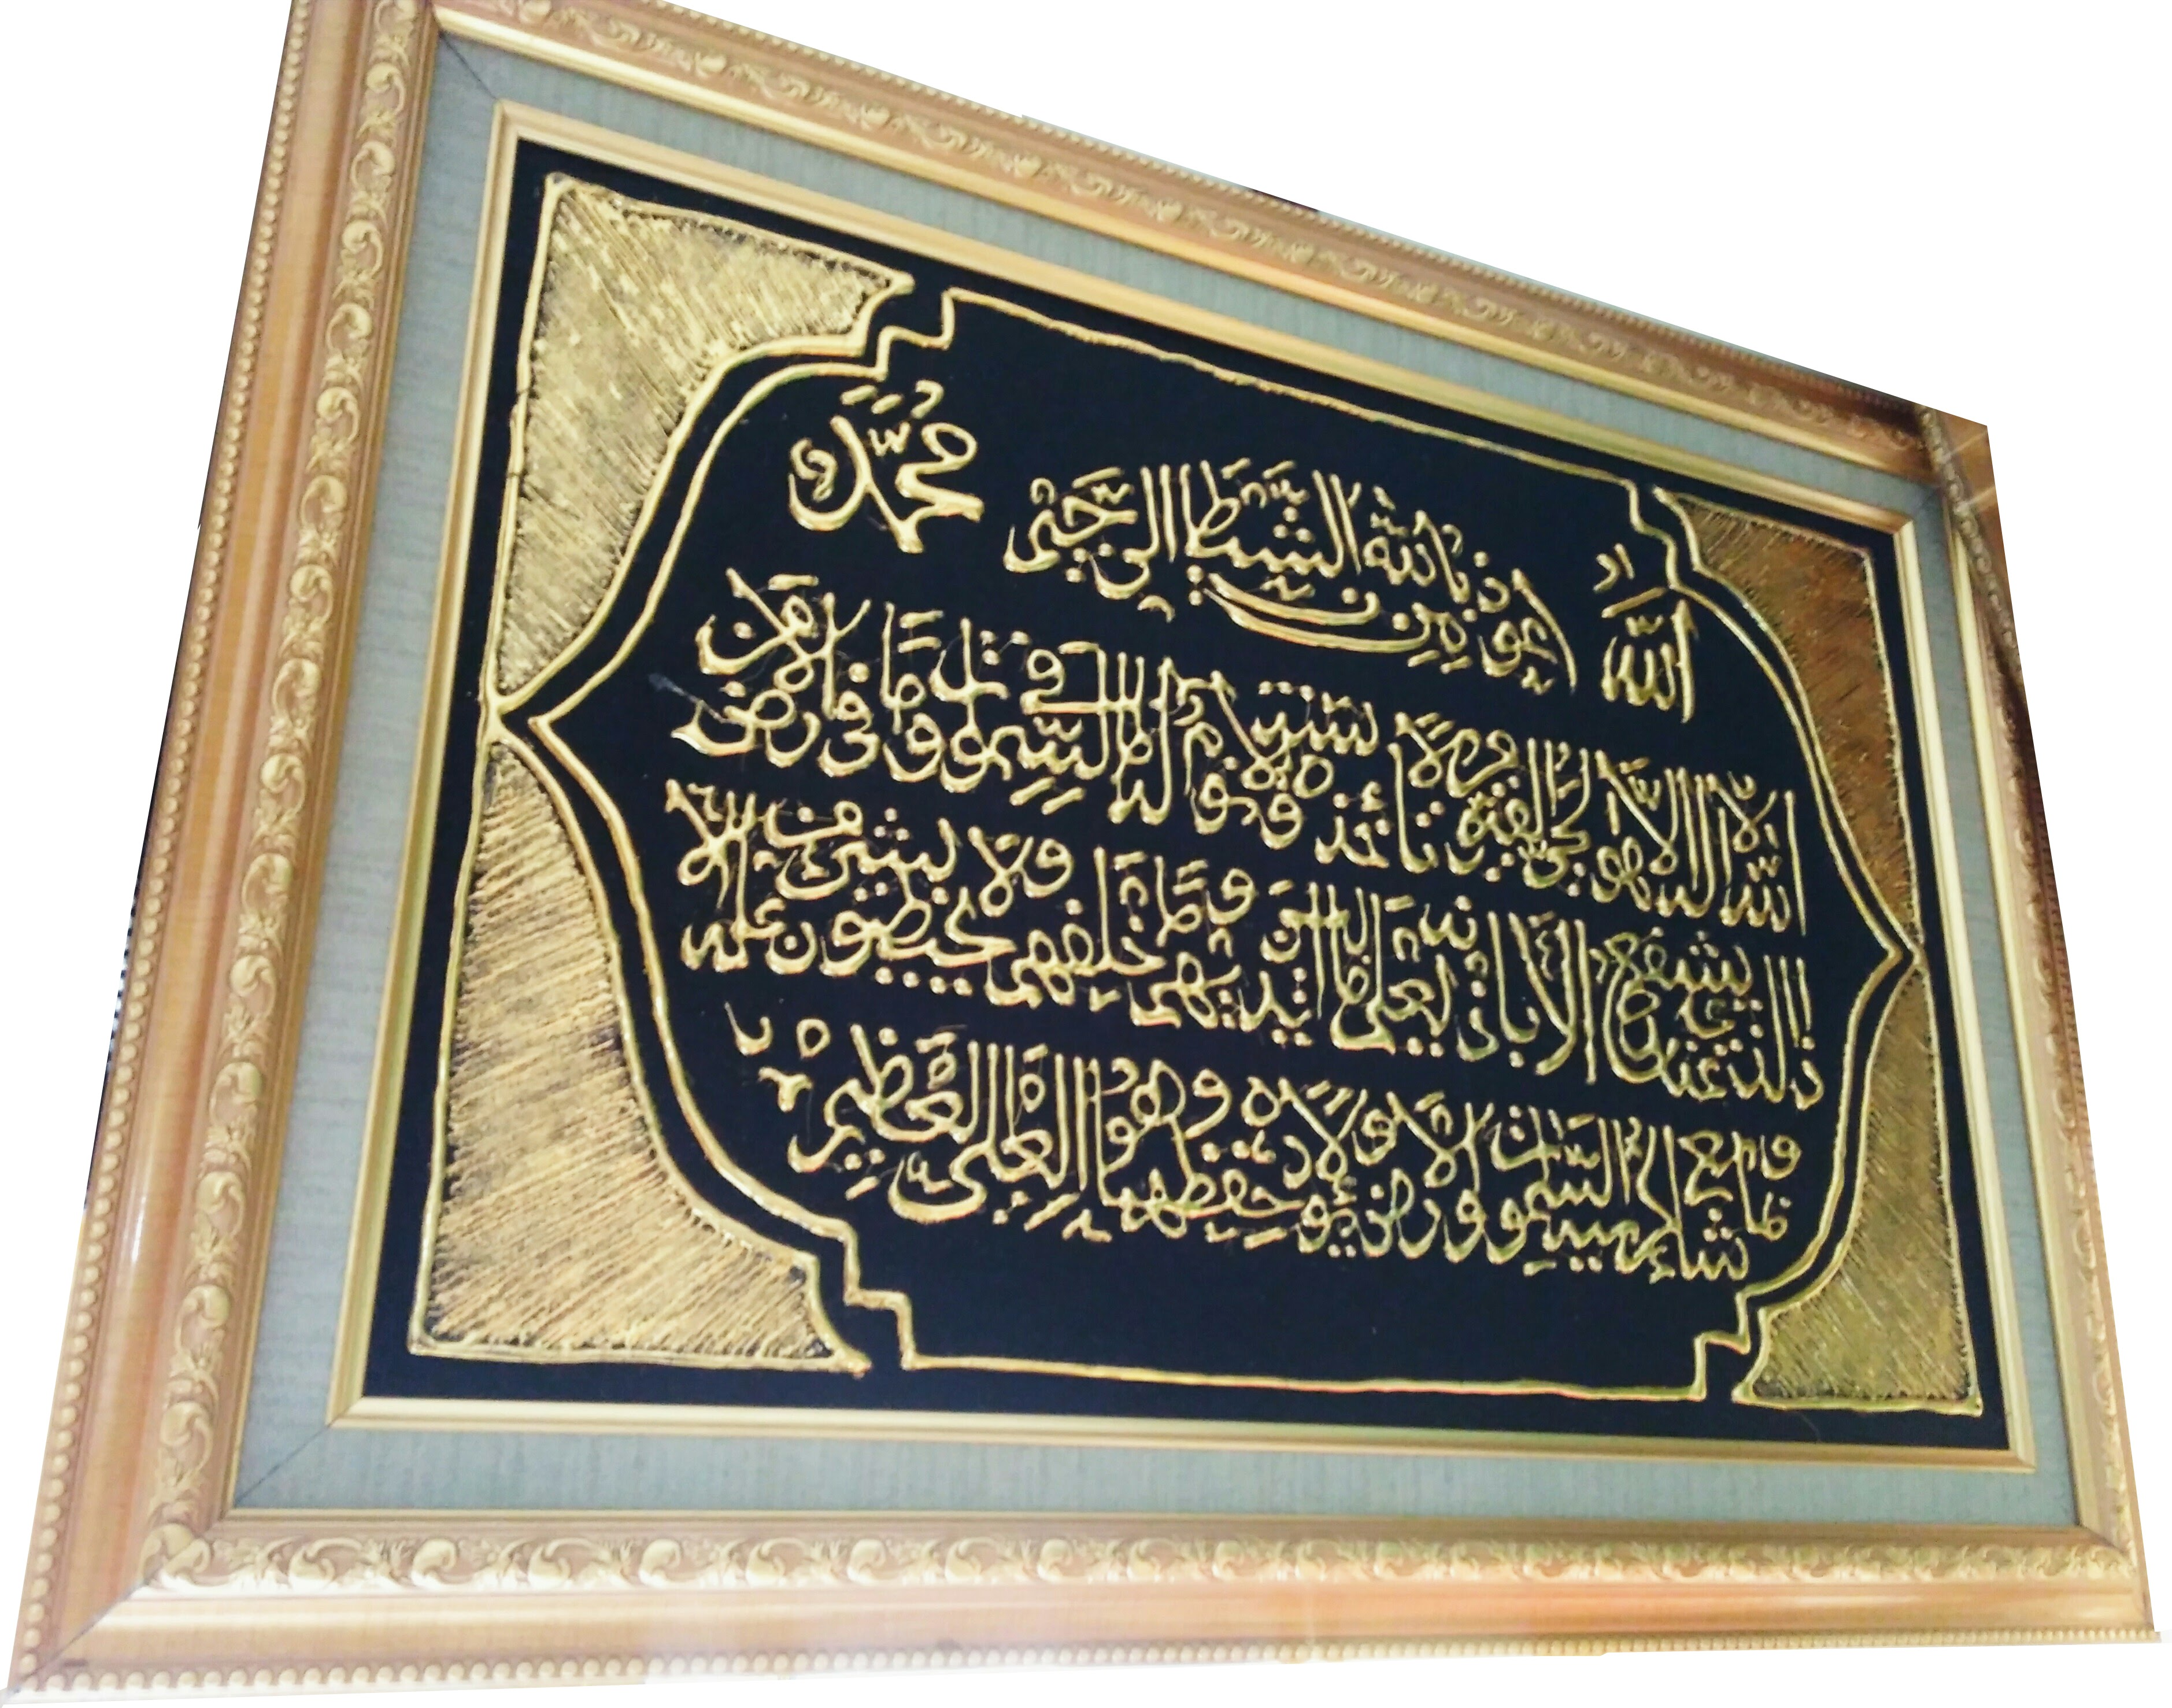 Kaligrafi Ayat Kursi Silikon Murah Berkualitas Kaligrafi Vertian Harga kaligrafi ayat kursi